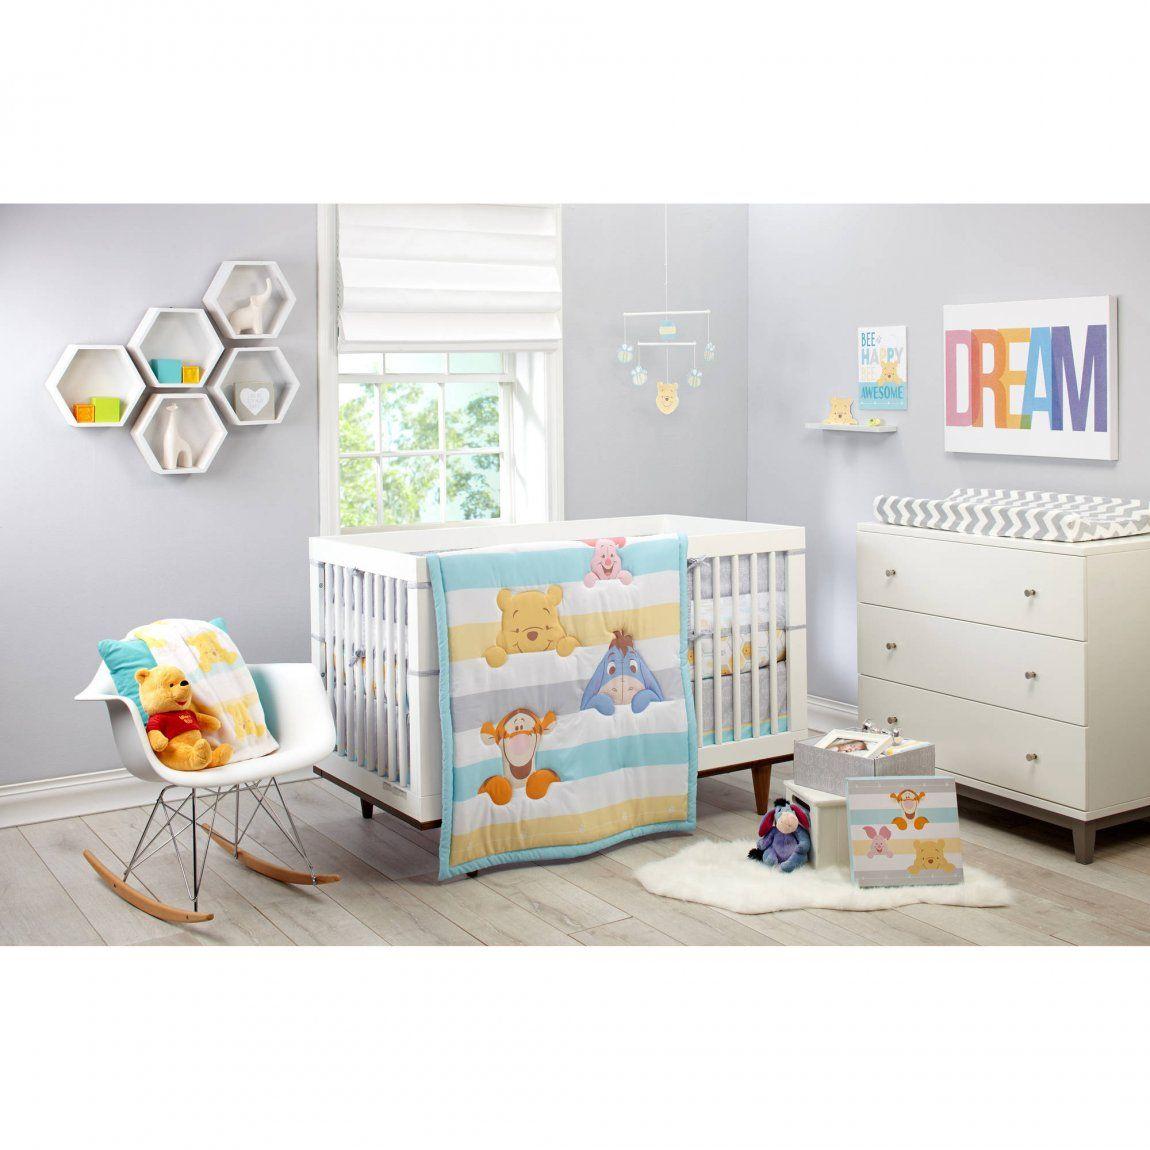 Nursery Bedroom Sets Crib Bedding Boy